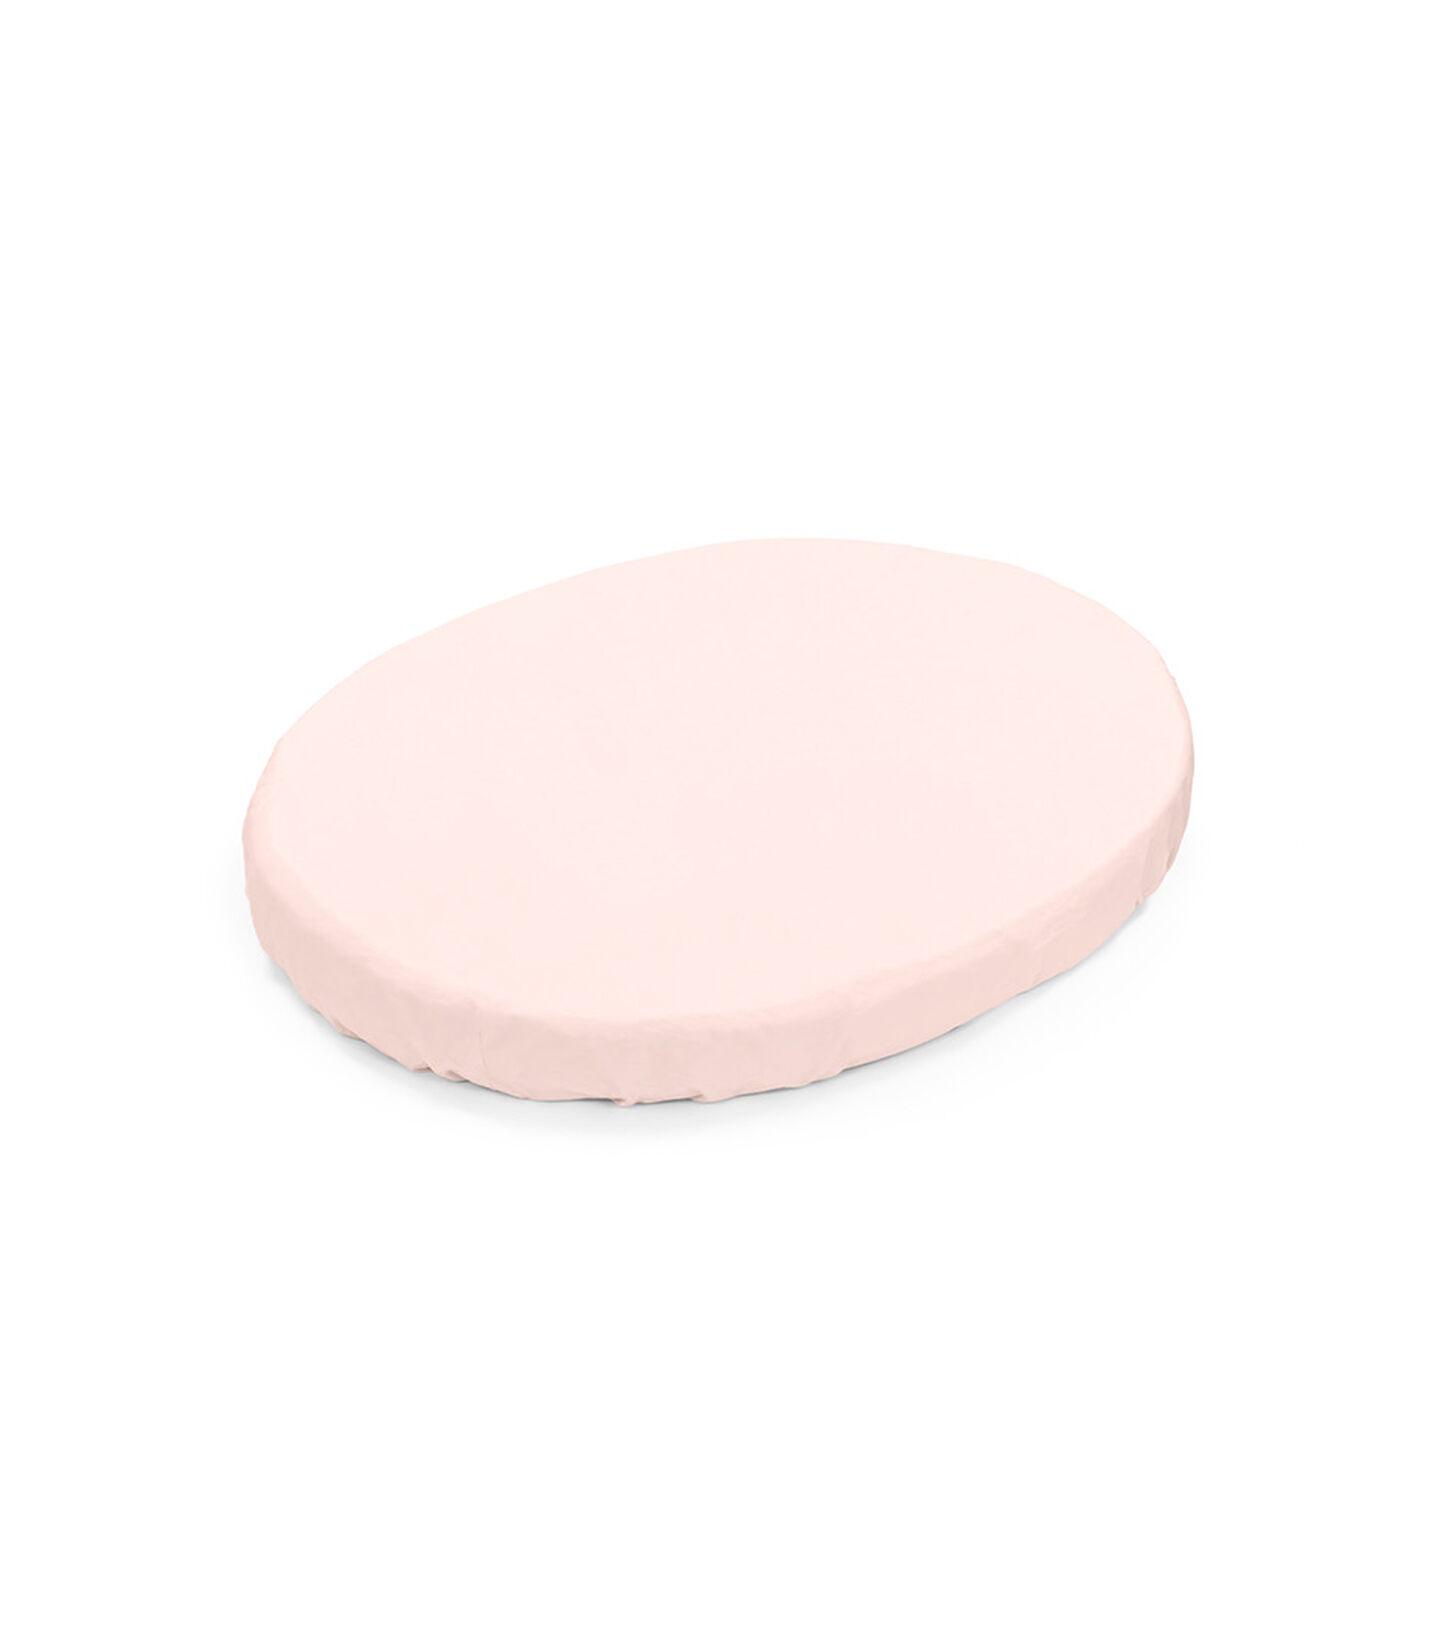 Stokke® Sleepi™ Mini hoeslaken perzikroze, Perzikroze, mainview view 1